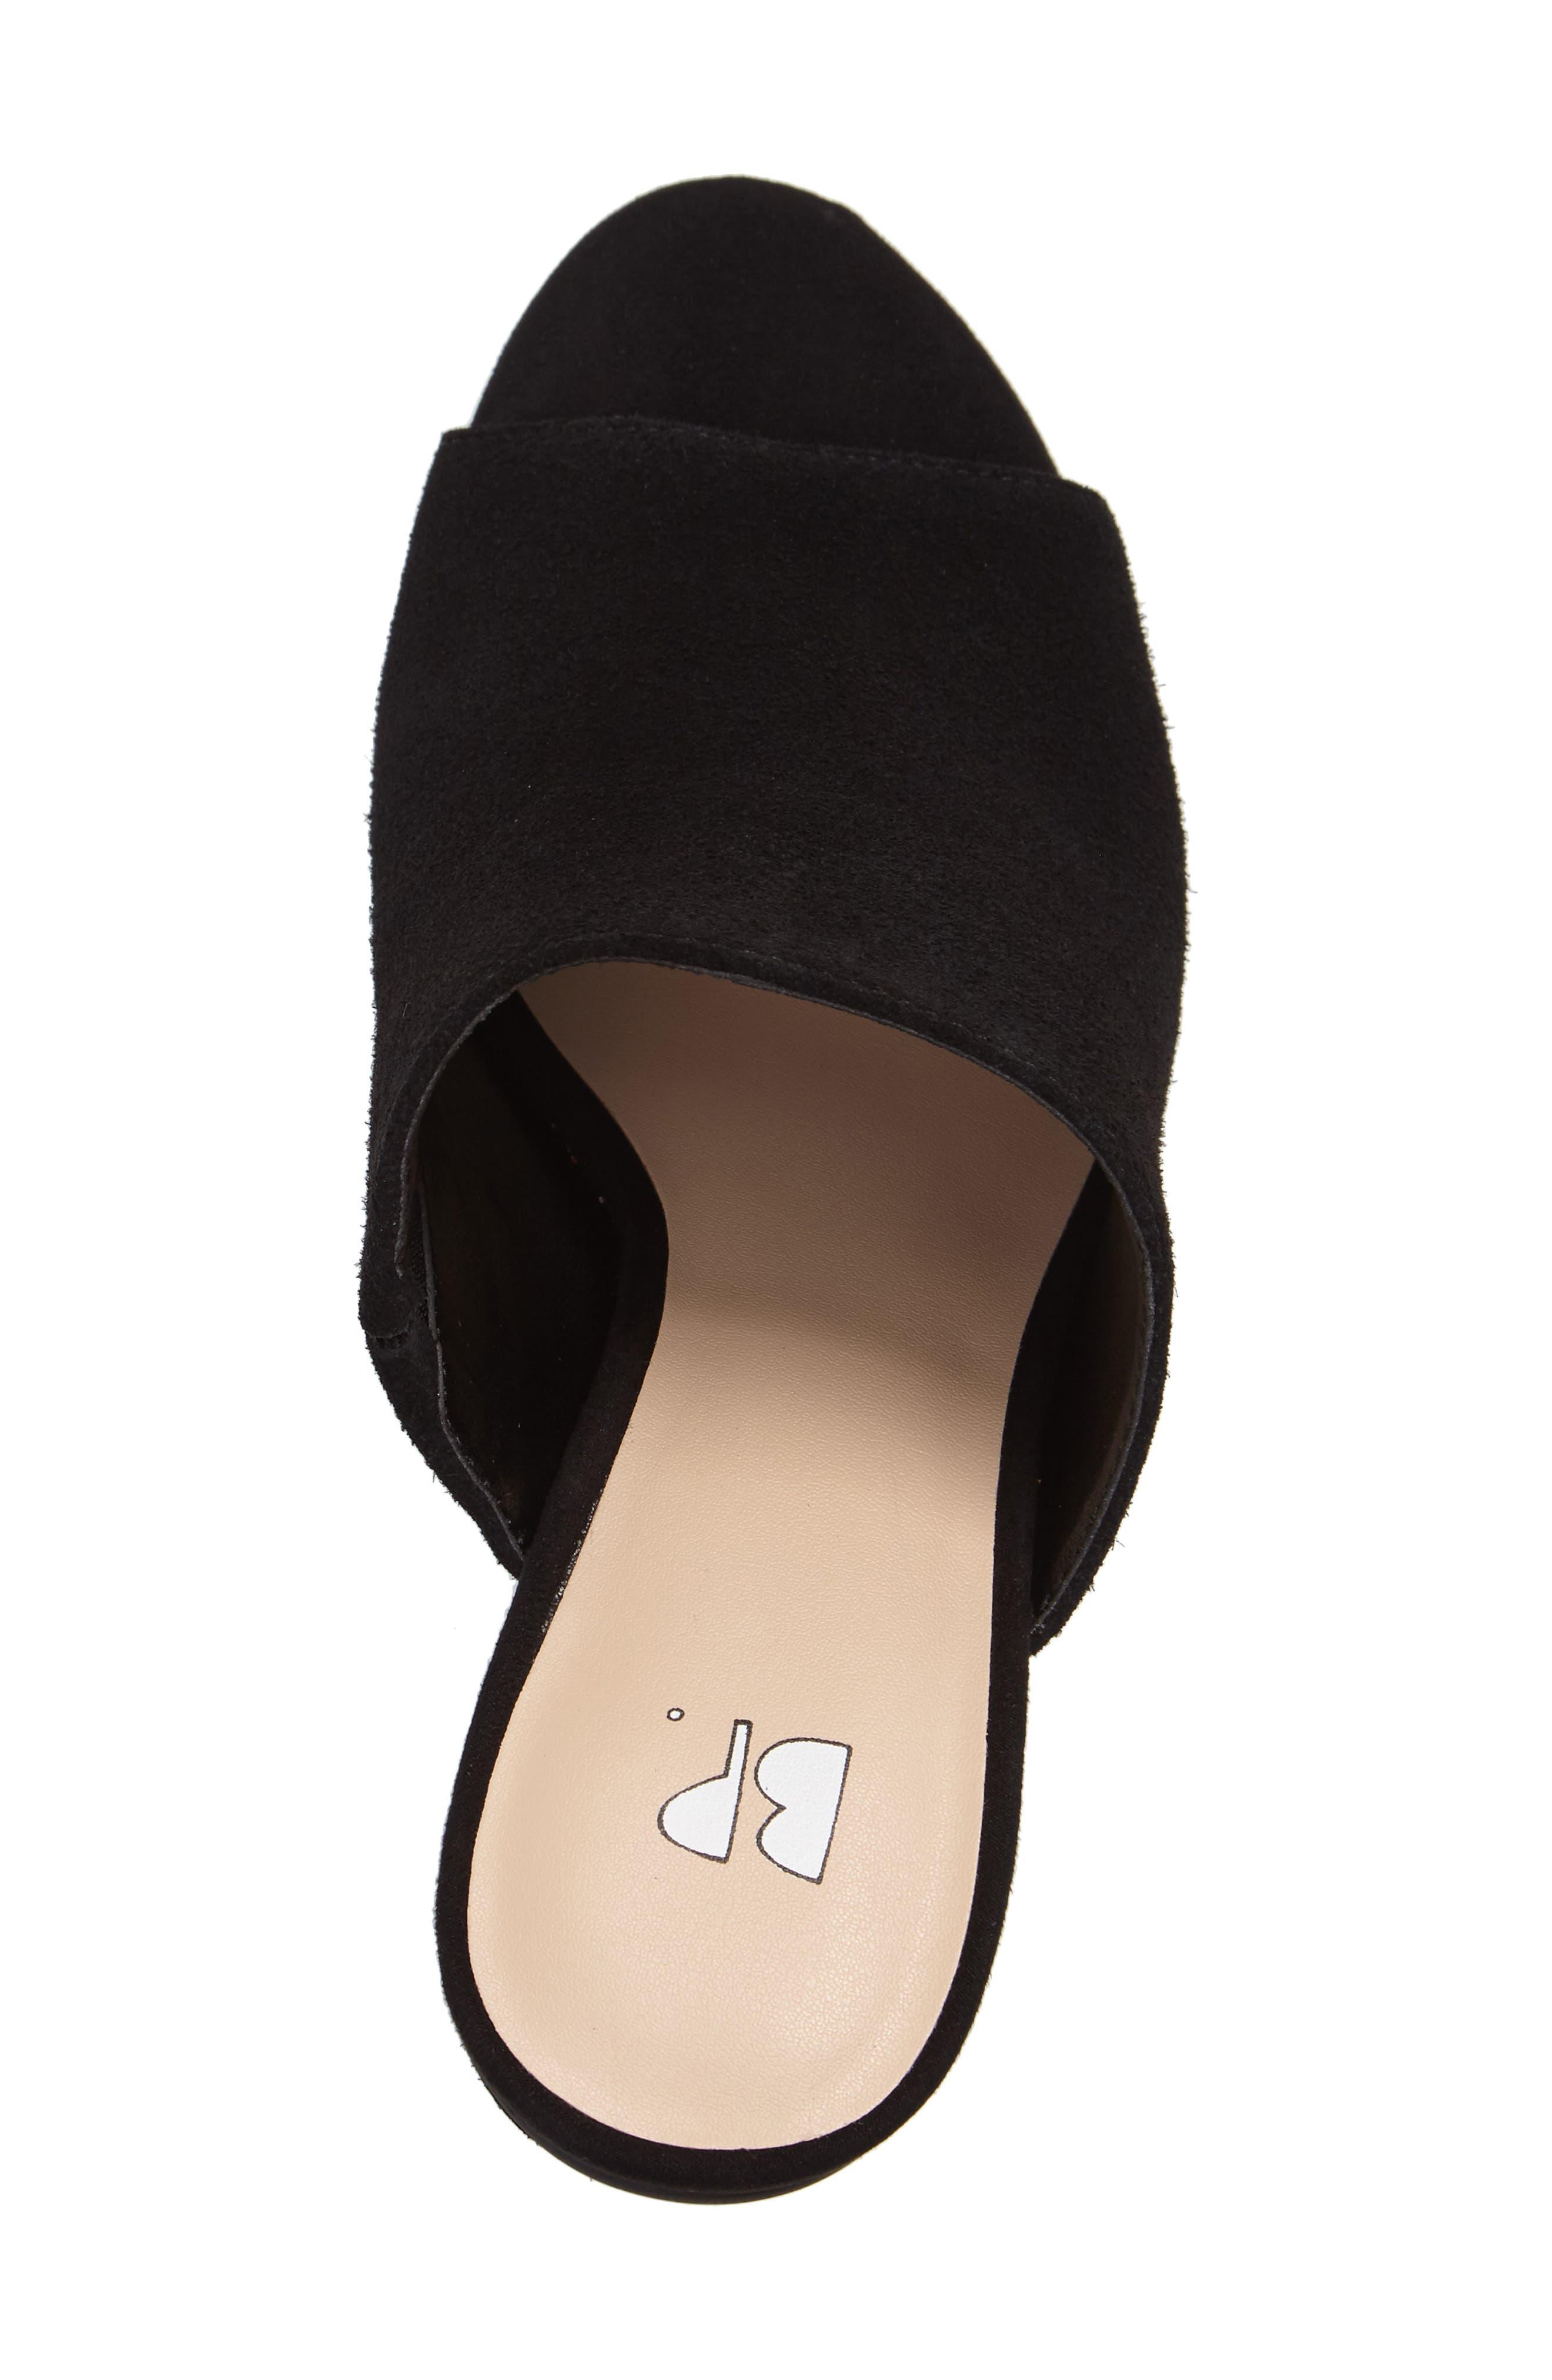 Tale Block Heel Sandal,                             Alternate thumbnail 3, color,                             001